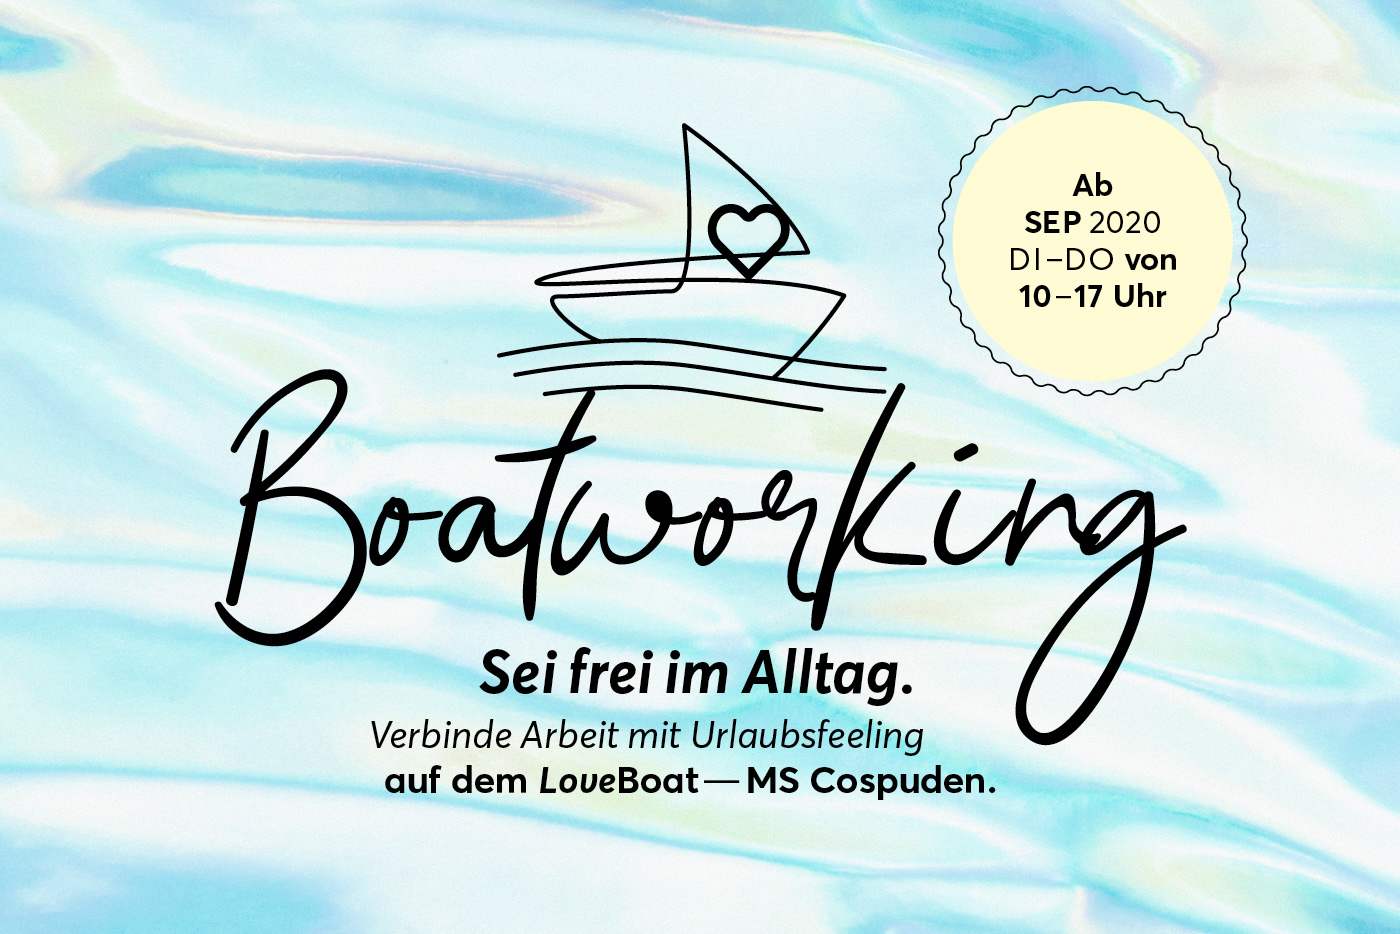 Boatworking, Coworking auf dem LoveBoat, MS Cospuden, Leipzig, ab 7. September 2020